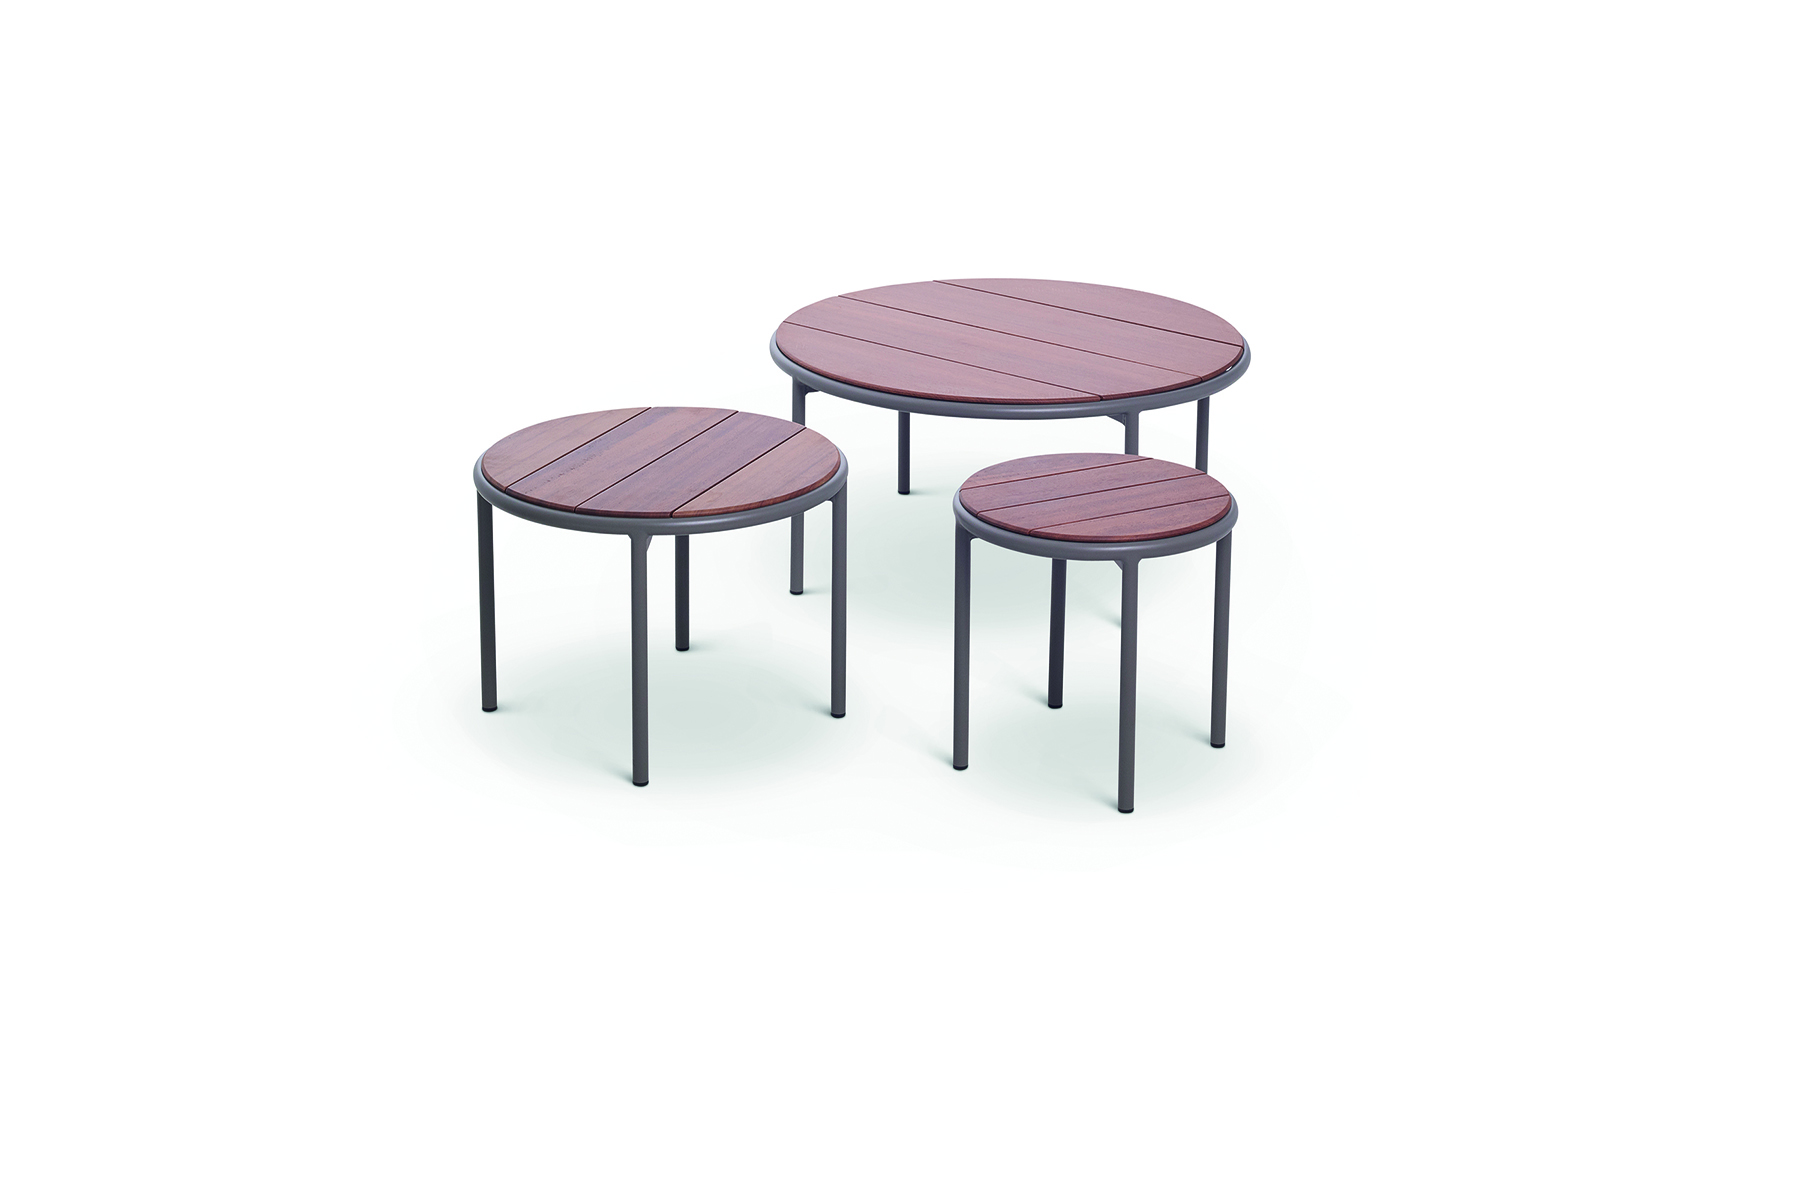 Teja IN low tables copia